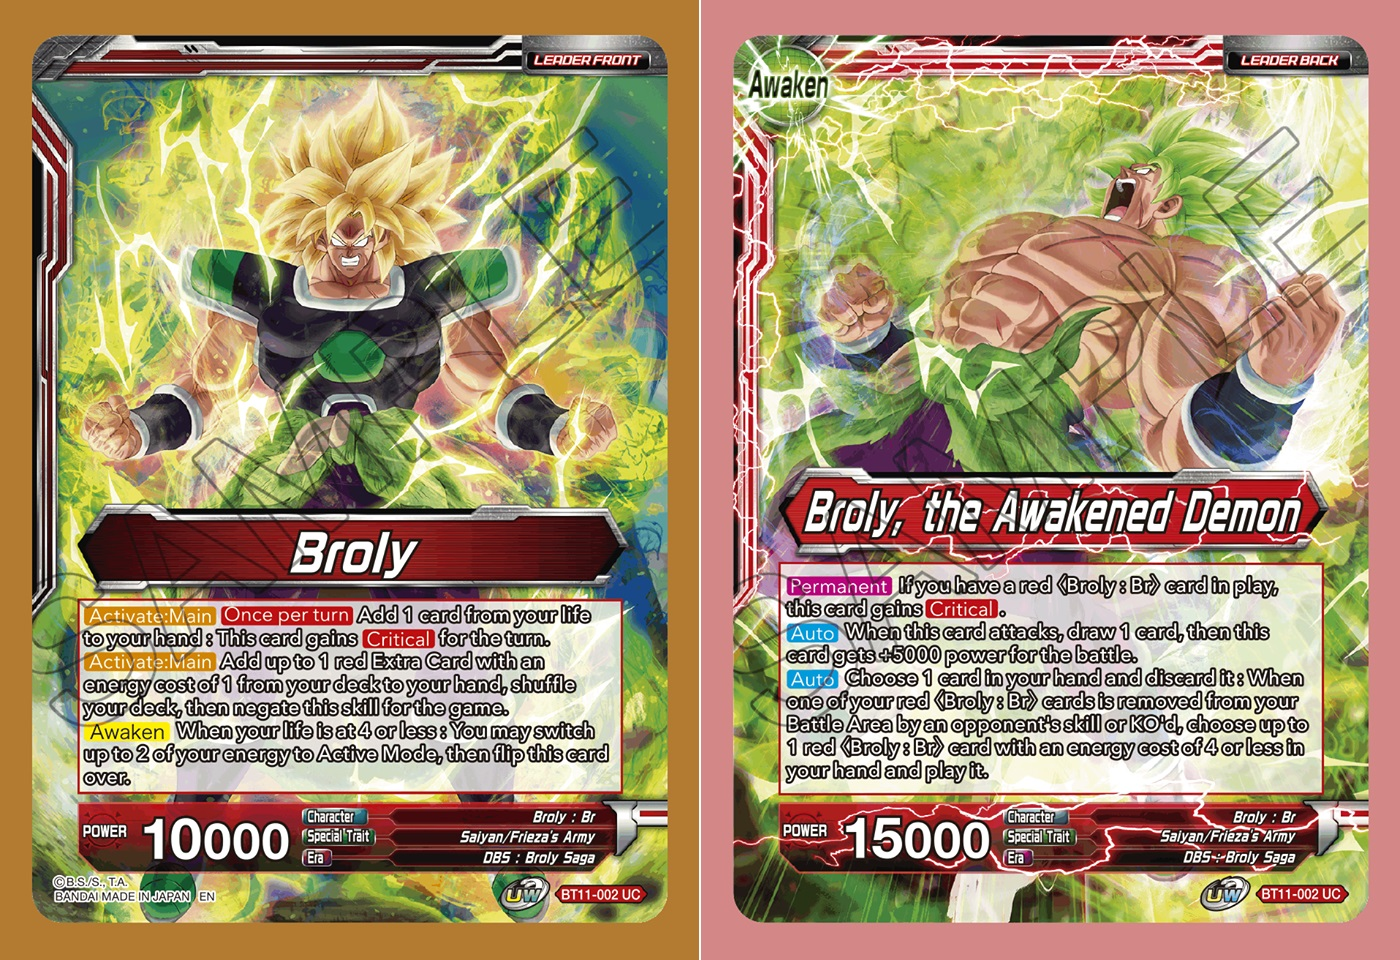 Broly // Broly, the Awakened Demon - BT11-002 - UC - Foil